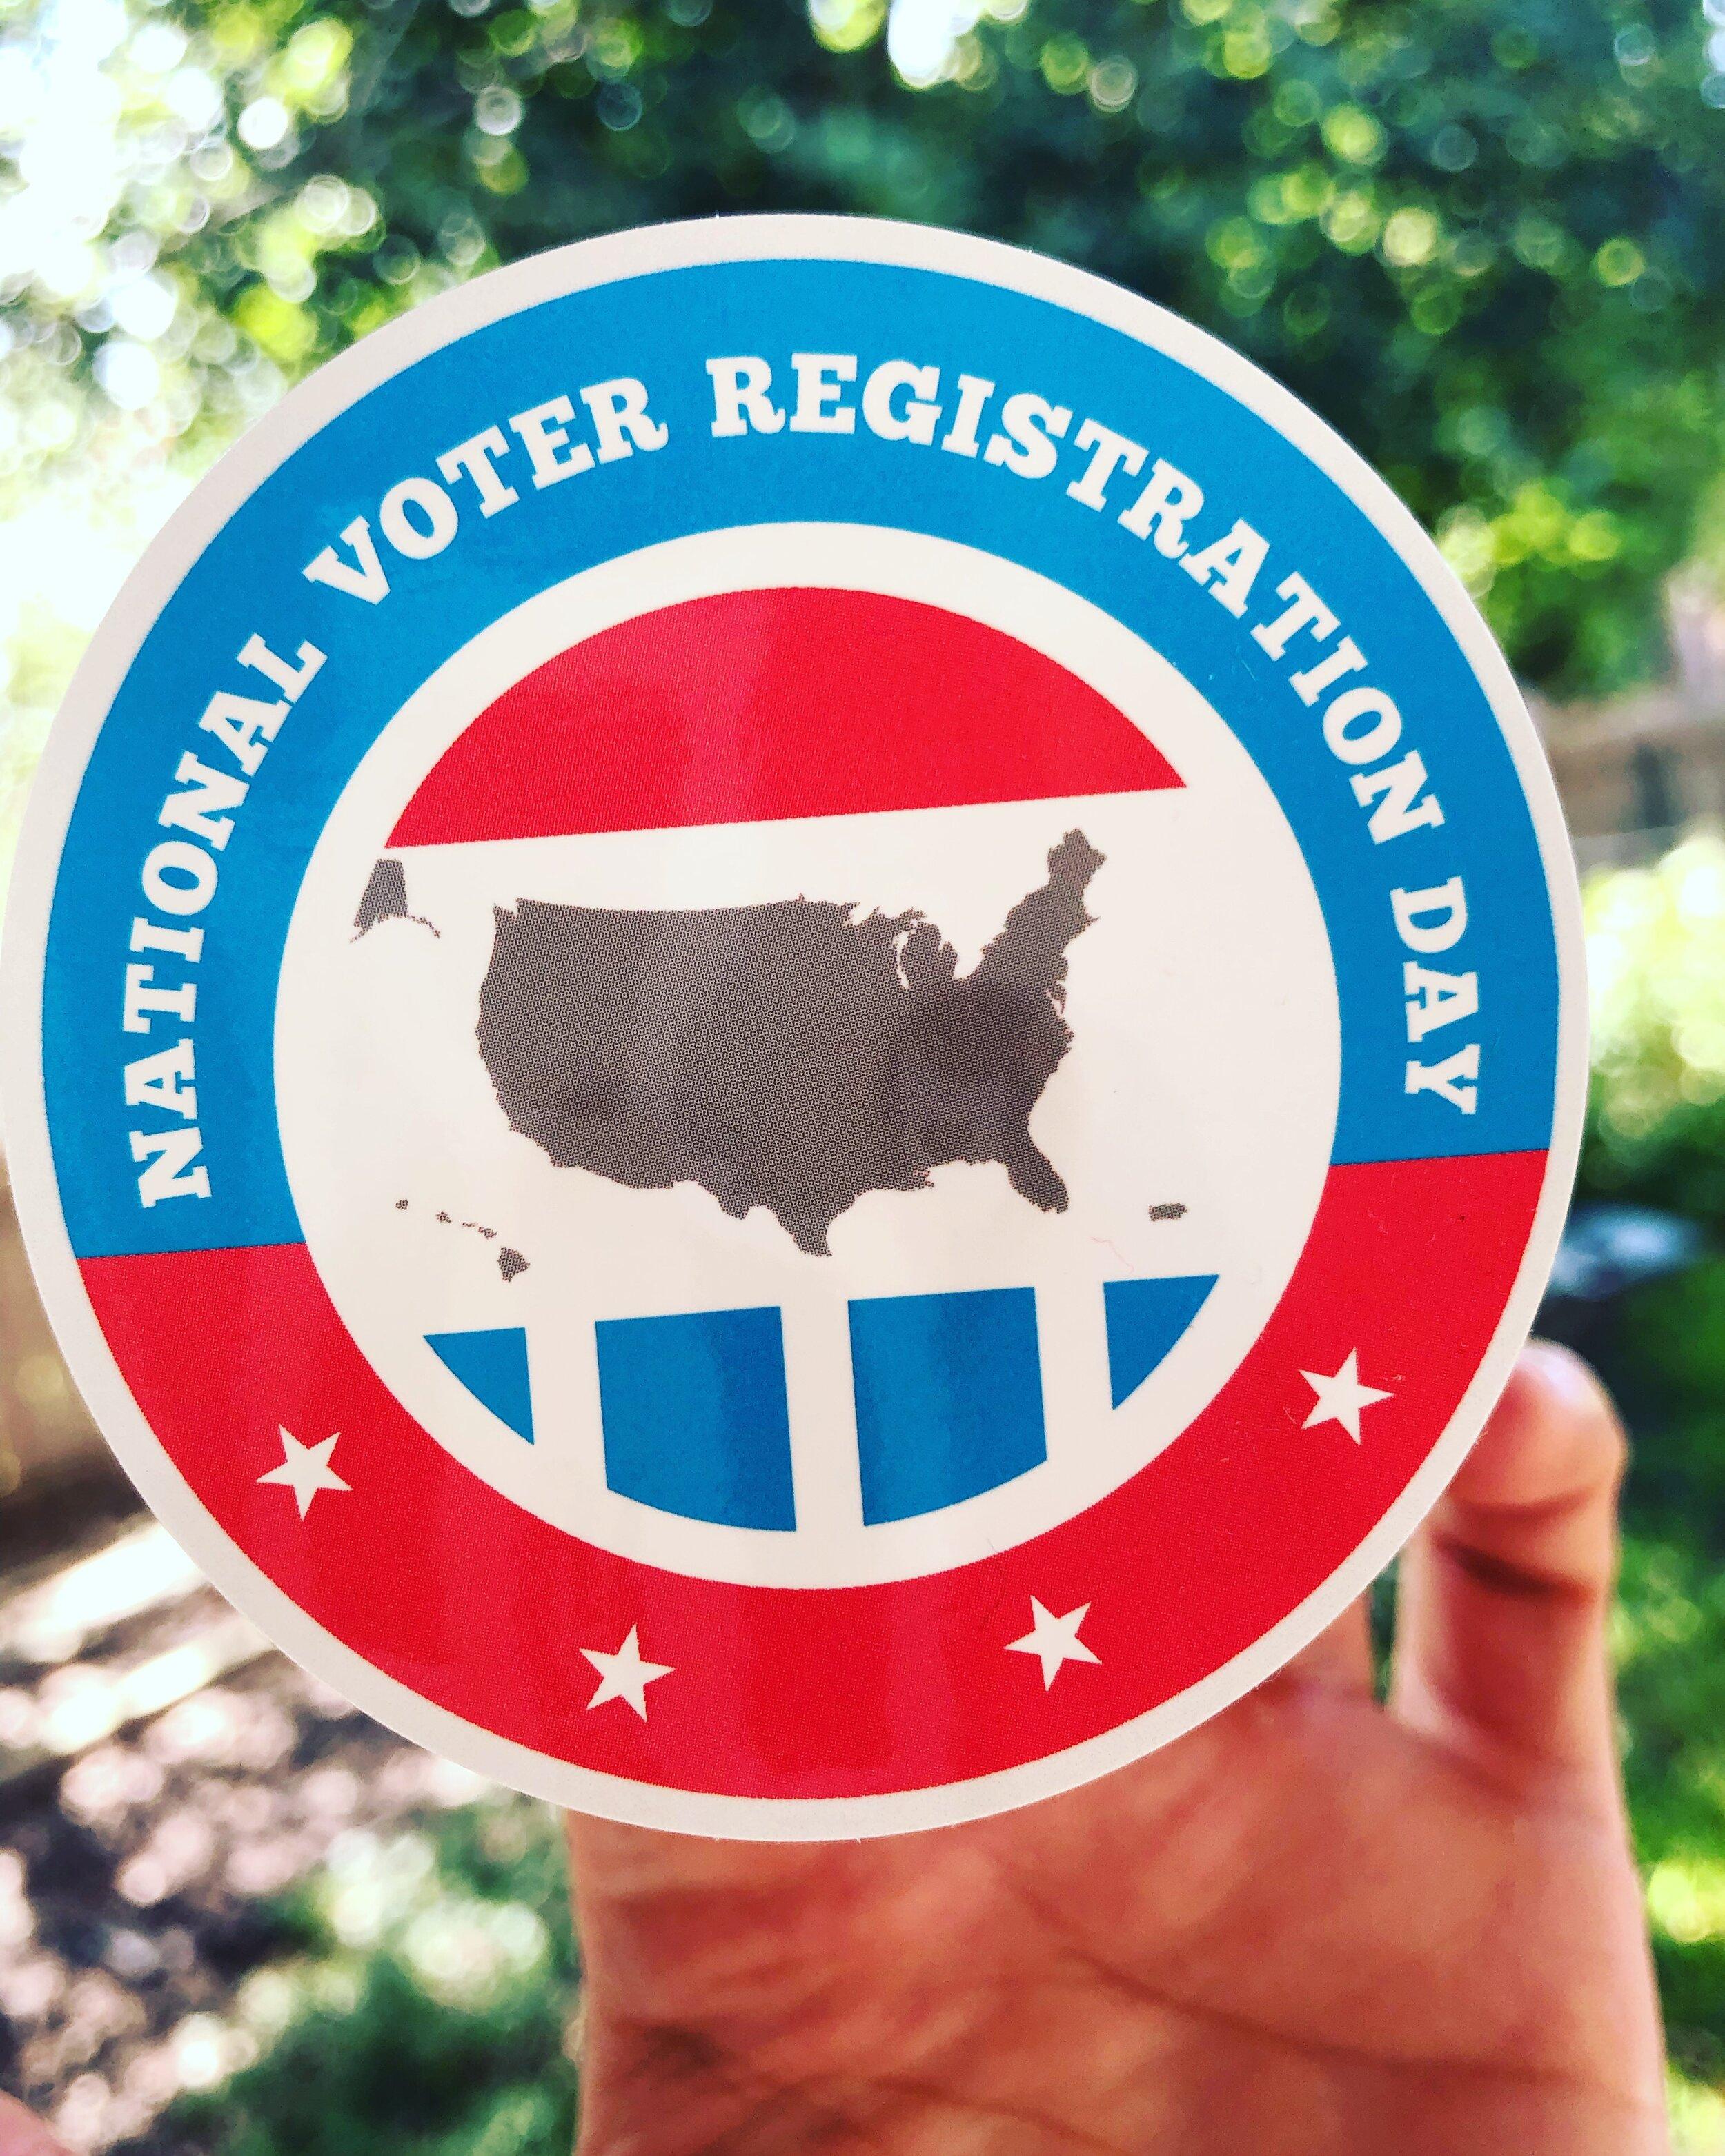 National Voter Registration Day / September 24, 2019